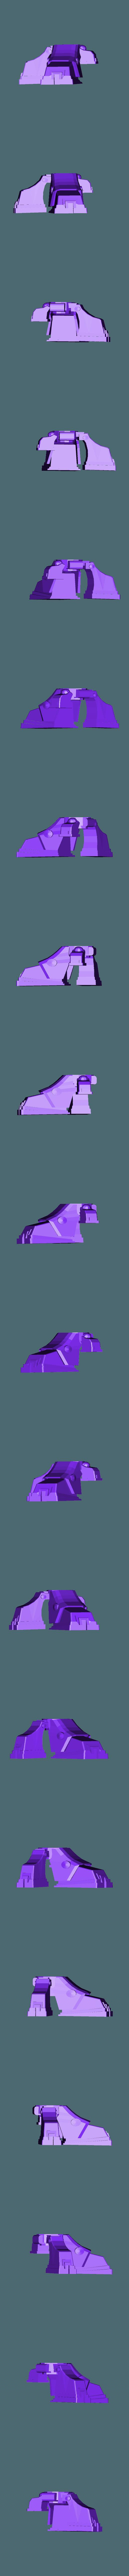 11Storm_Surge_FootX2.obj Download free OBJ file Tempest Rush Mech • 3D printer model, Leesedrenfort